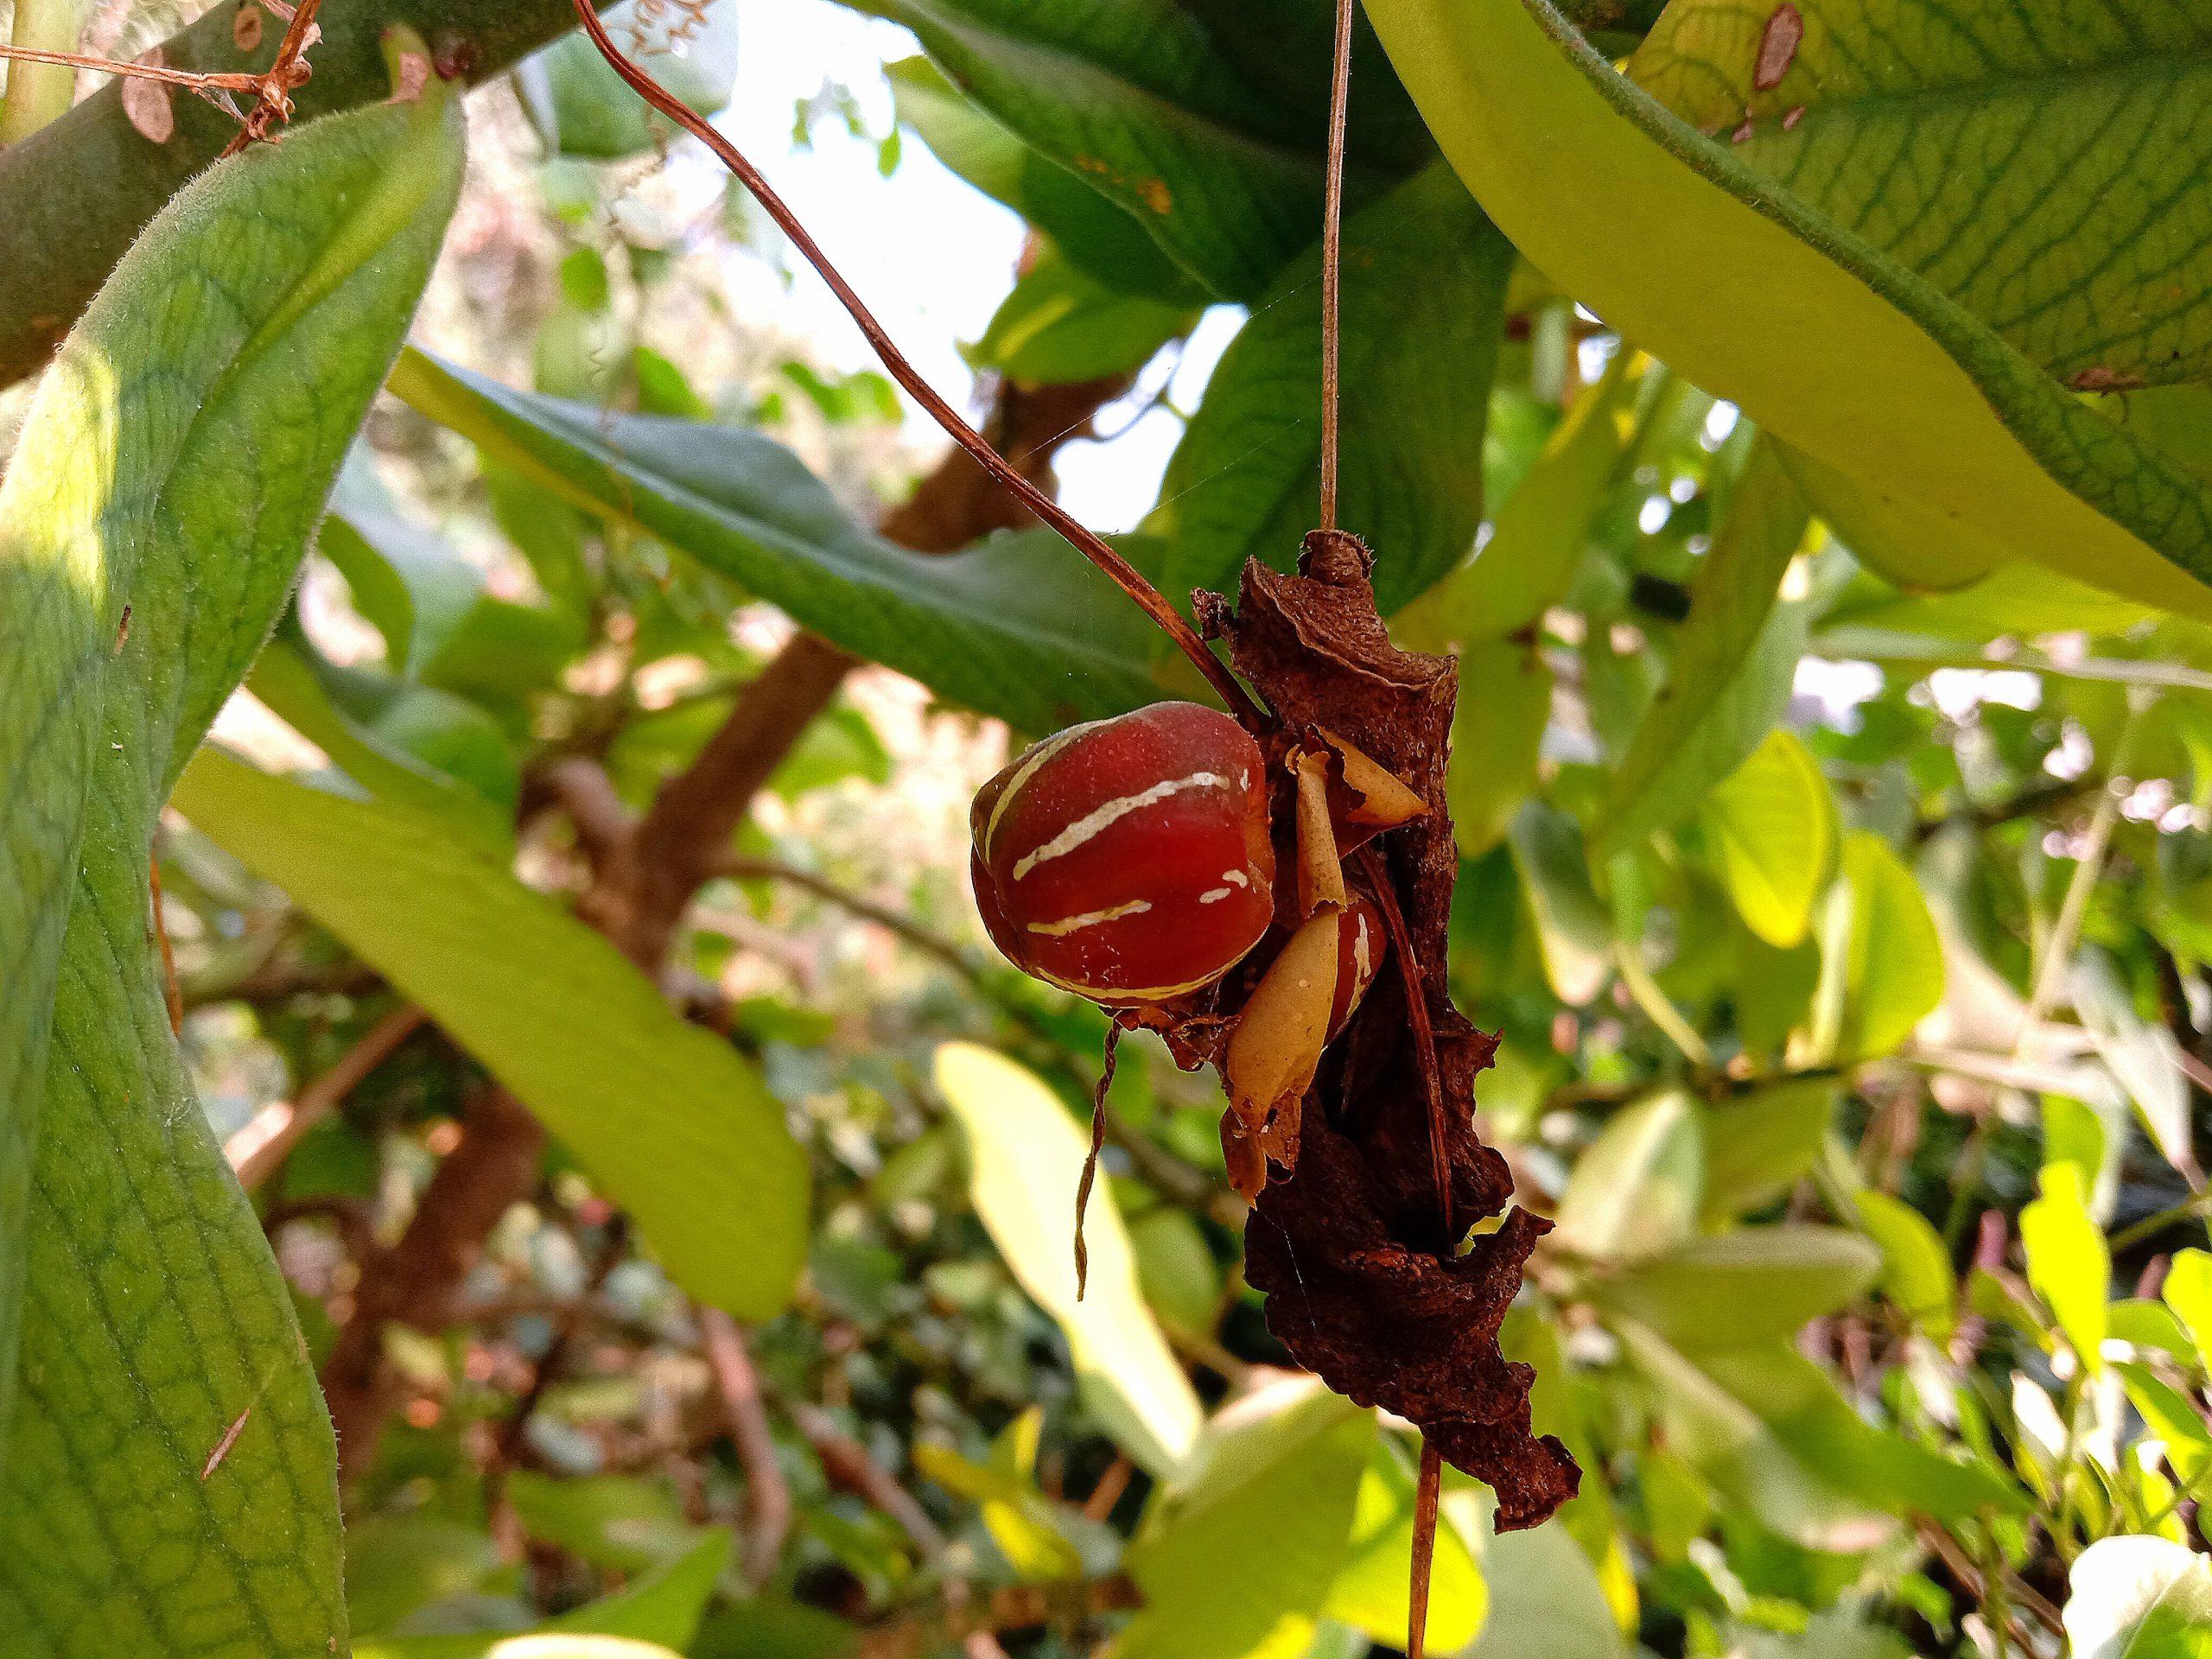 Wild fruit on the plant